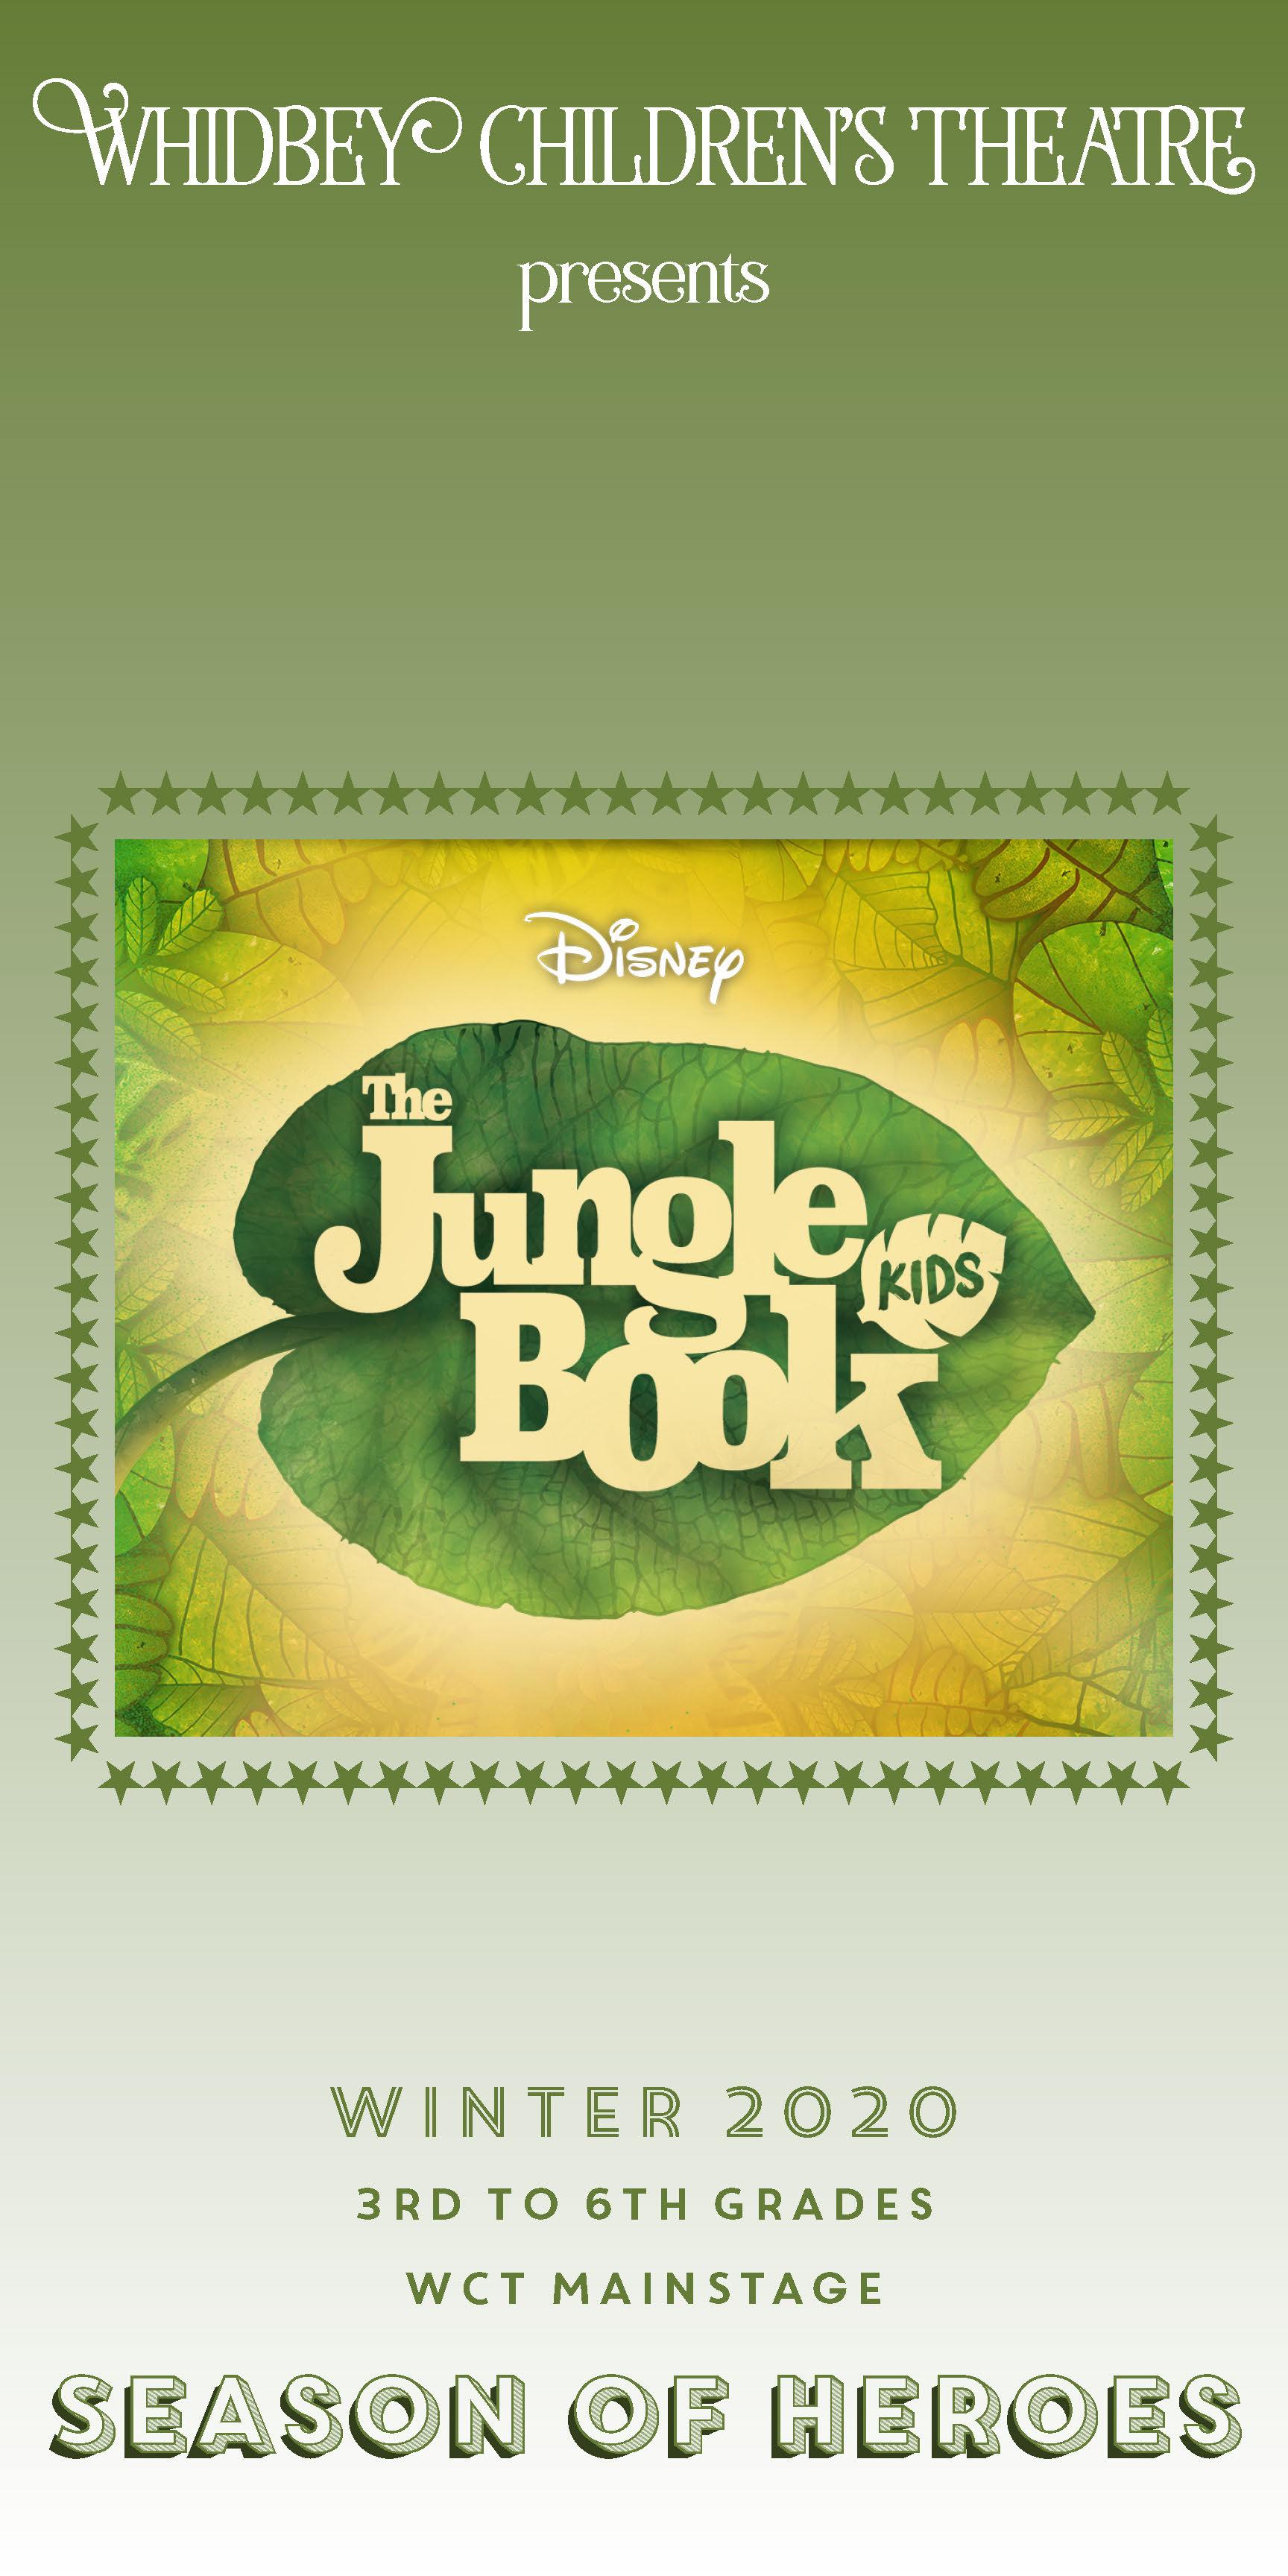 SOH Jungle Book WTR 2020.jpg